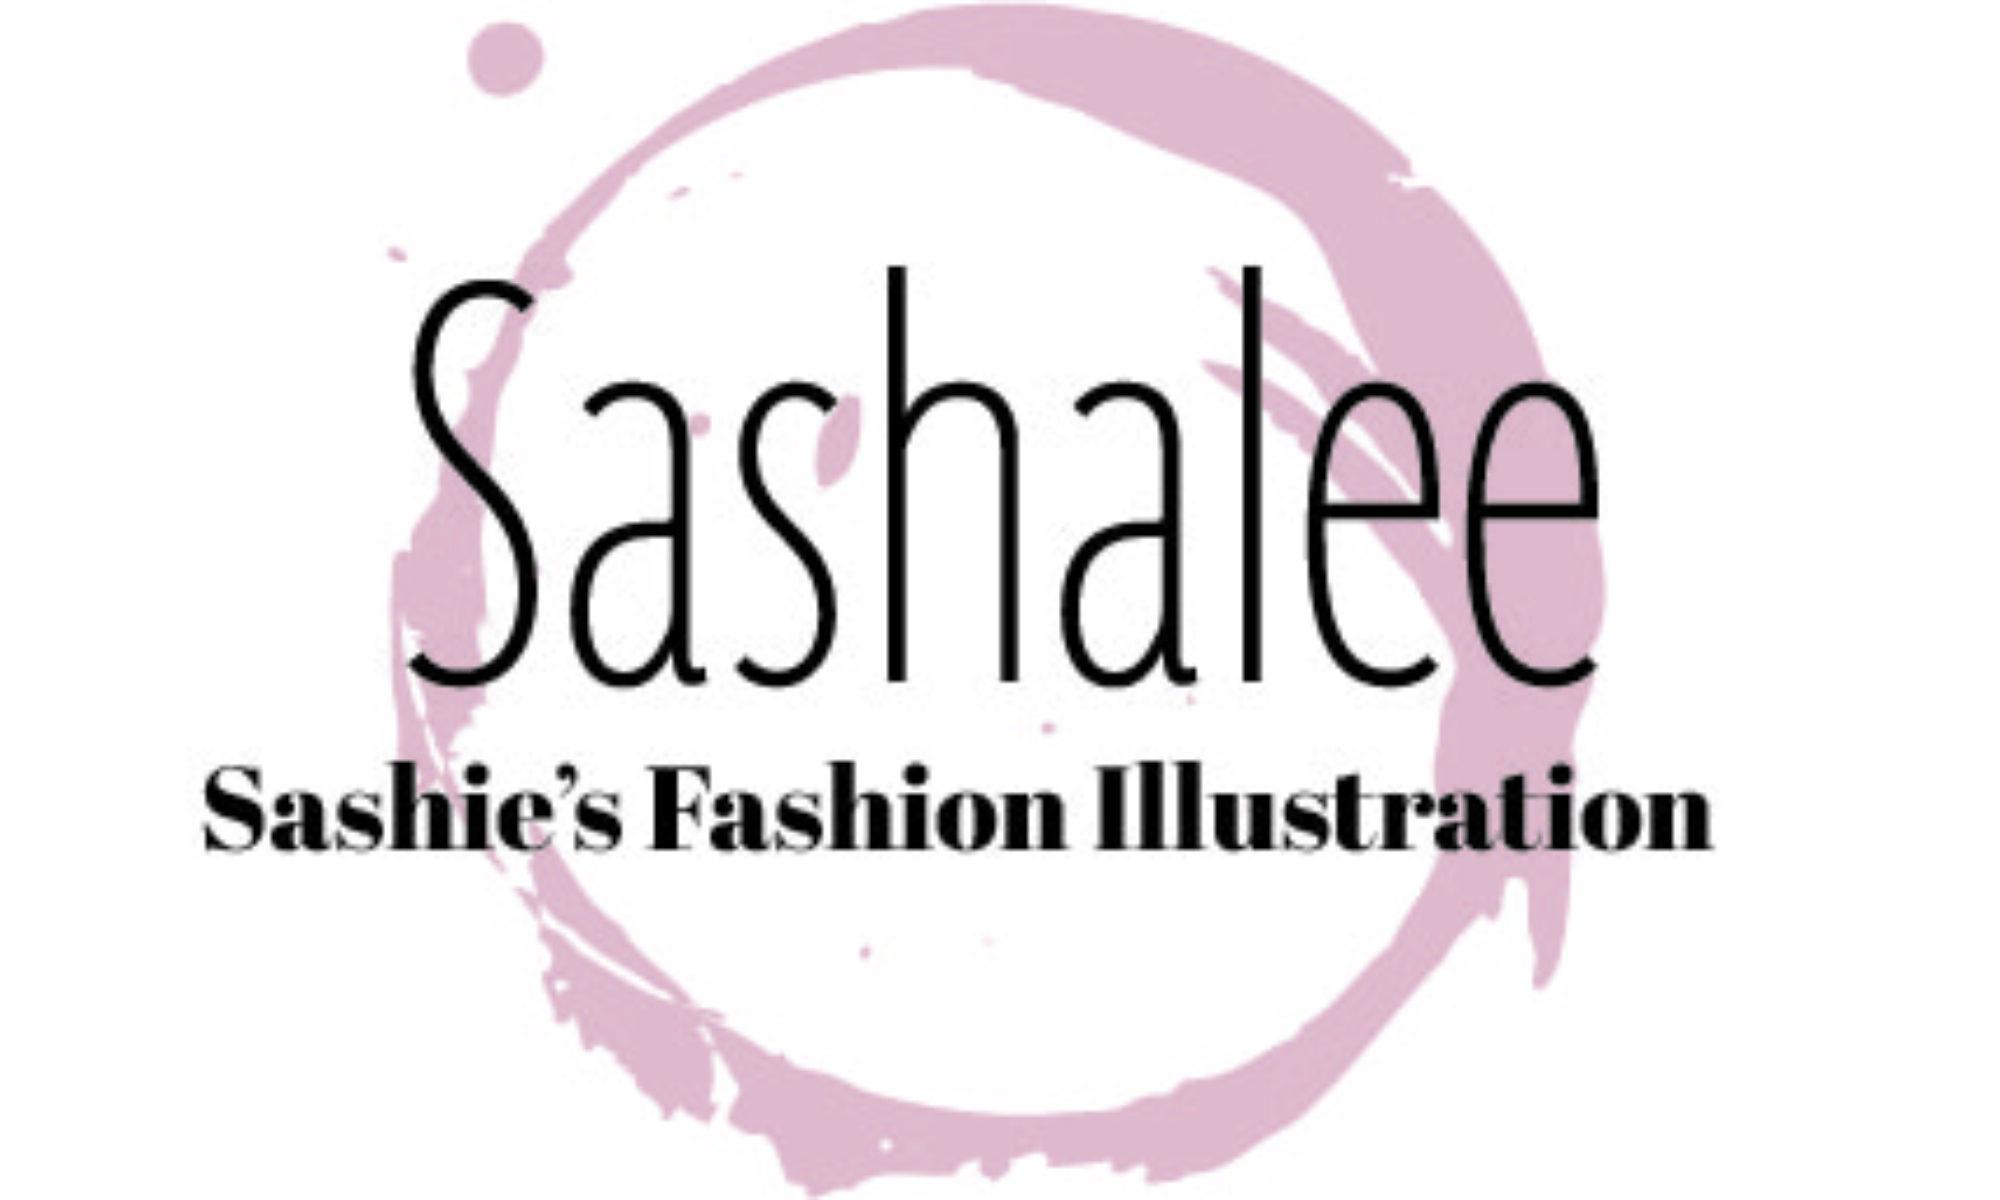 sashalee harrison's ePortfolio